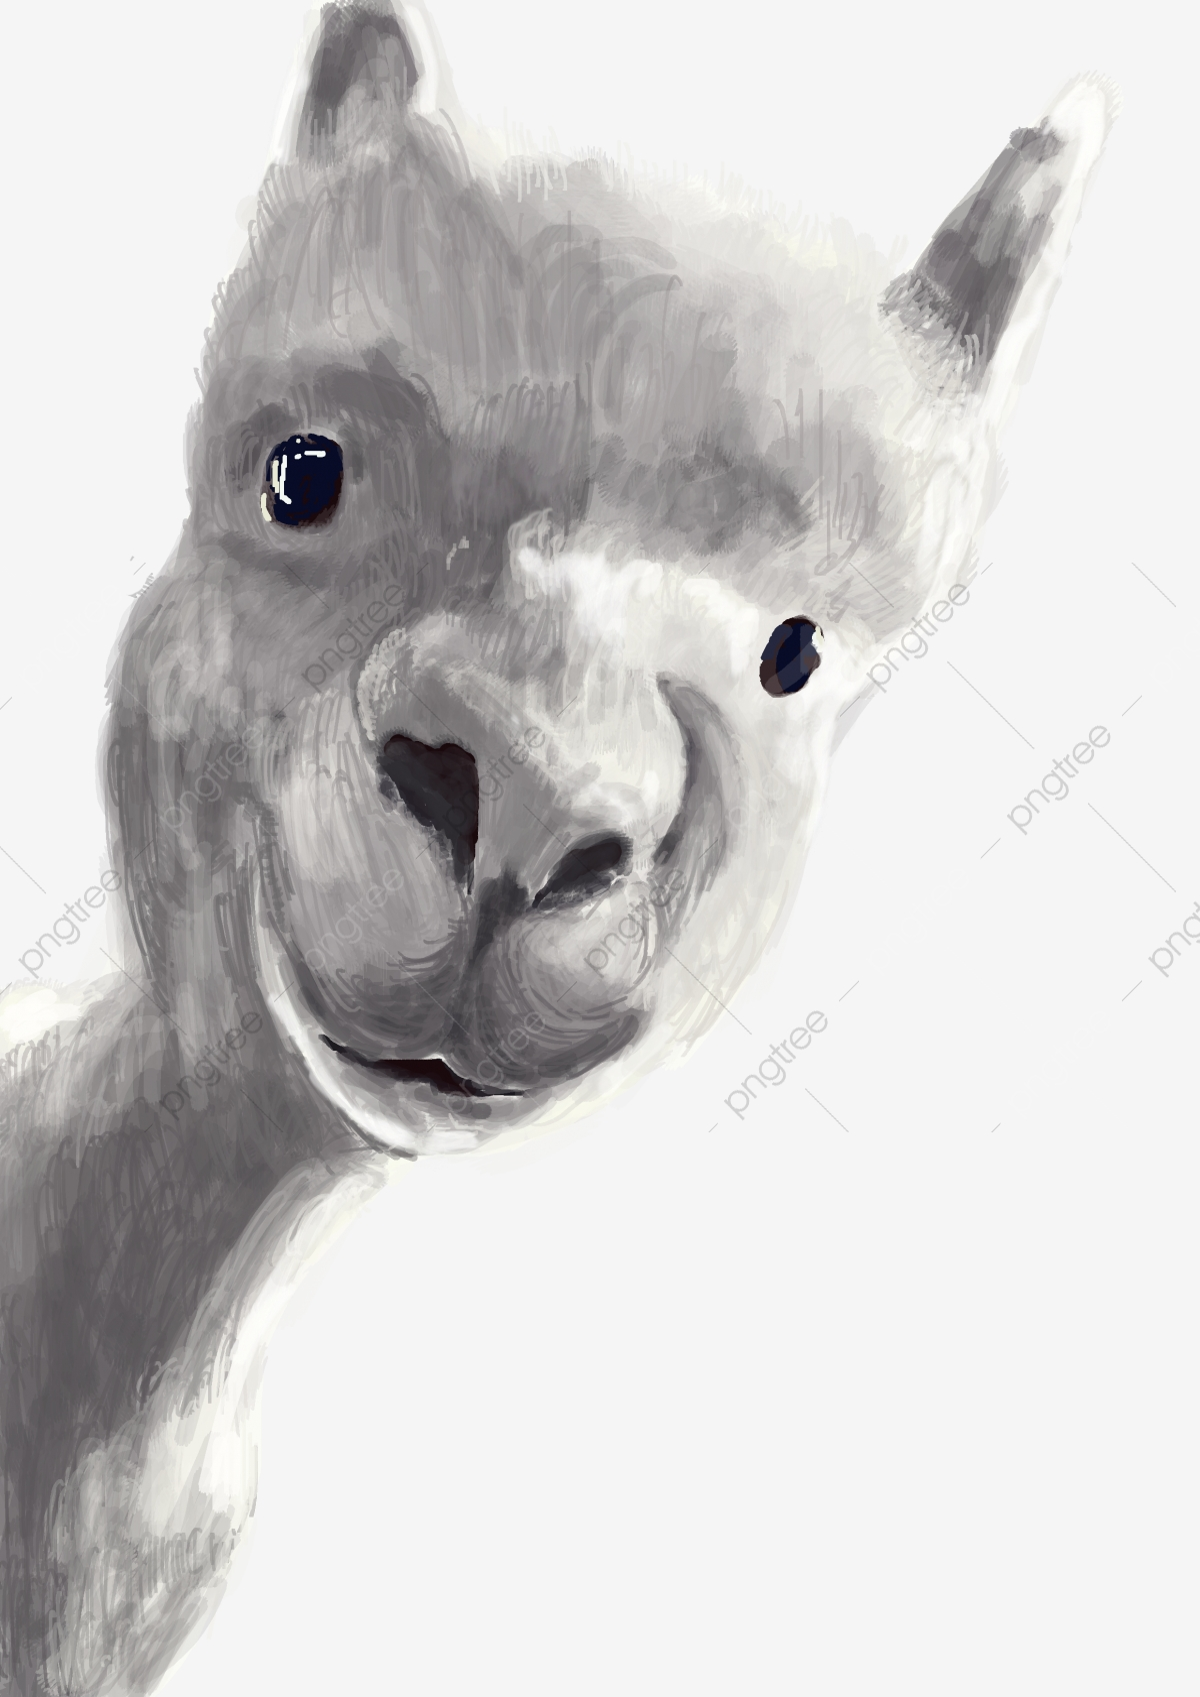 Illustration Animale Dessin Animalier Réaliste Cartoon